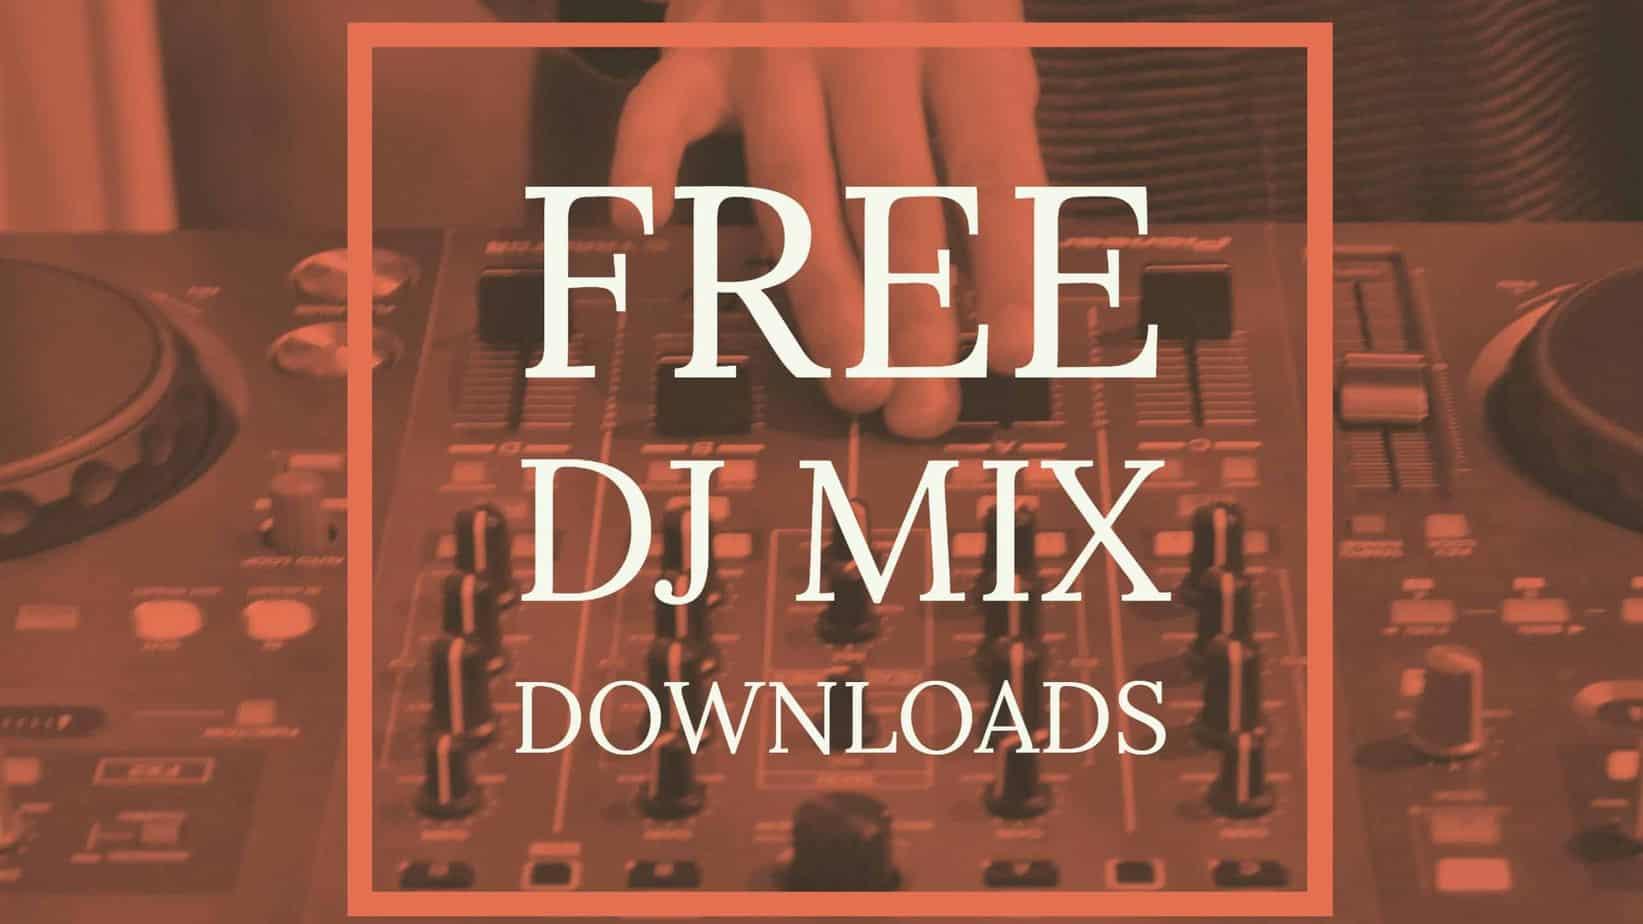 Free DJ Mix Downloads - Storm DJs London Agency